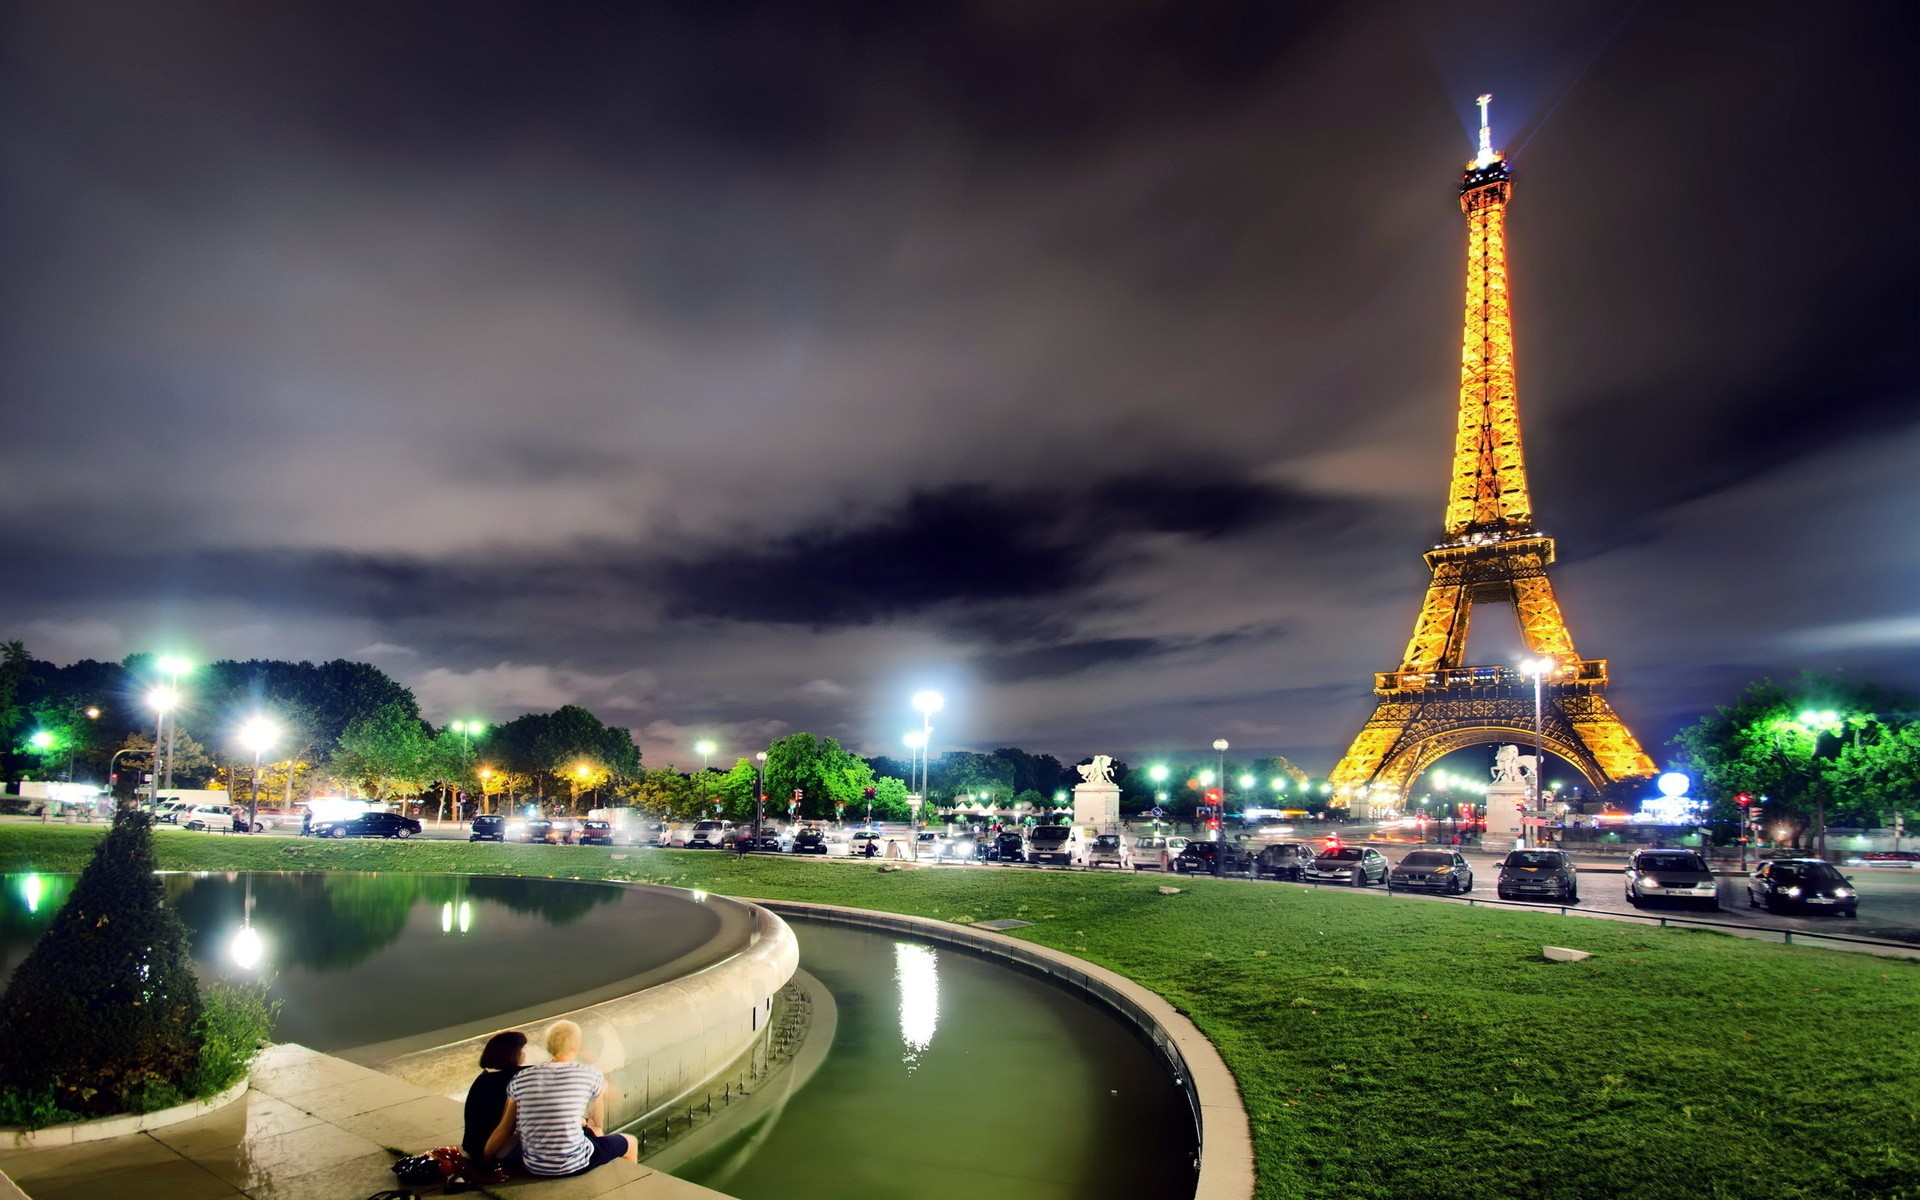 Download Wallpaper Paris Cute Eiffel Tower Backgrounds Pixelstalk Net